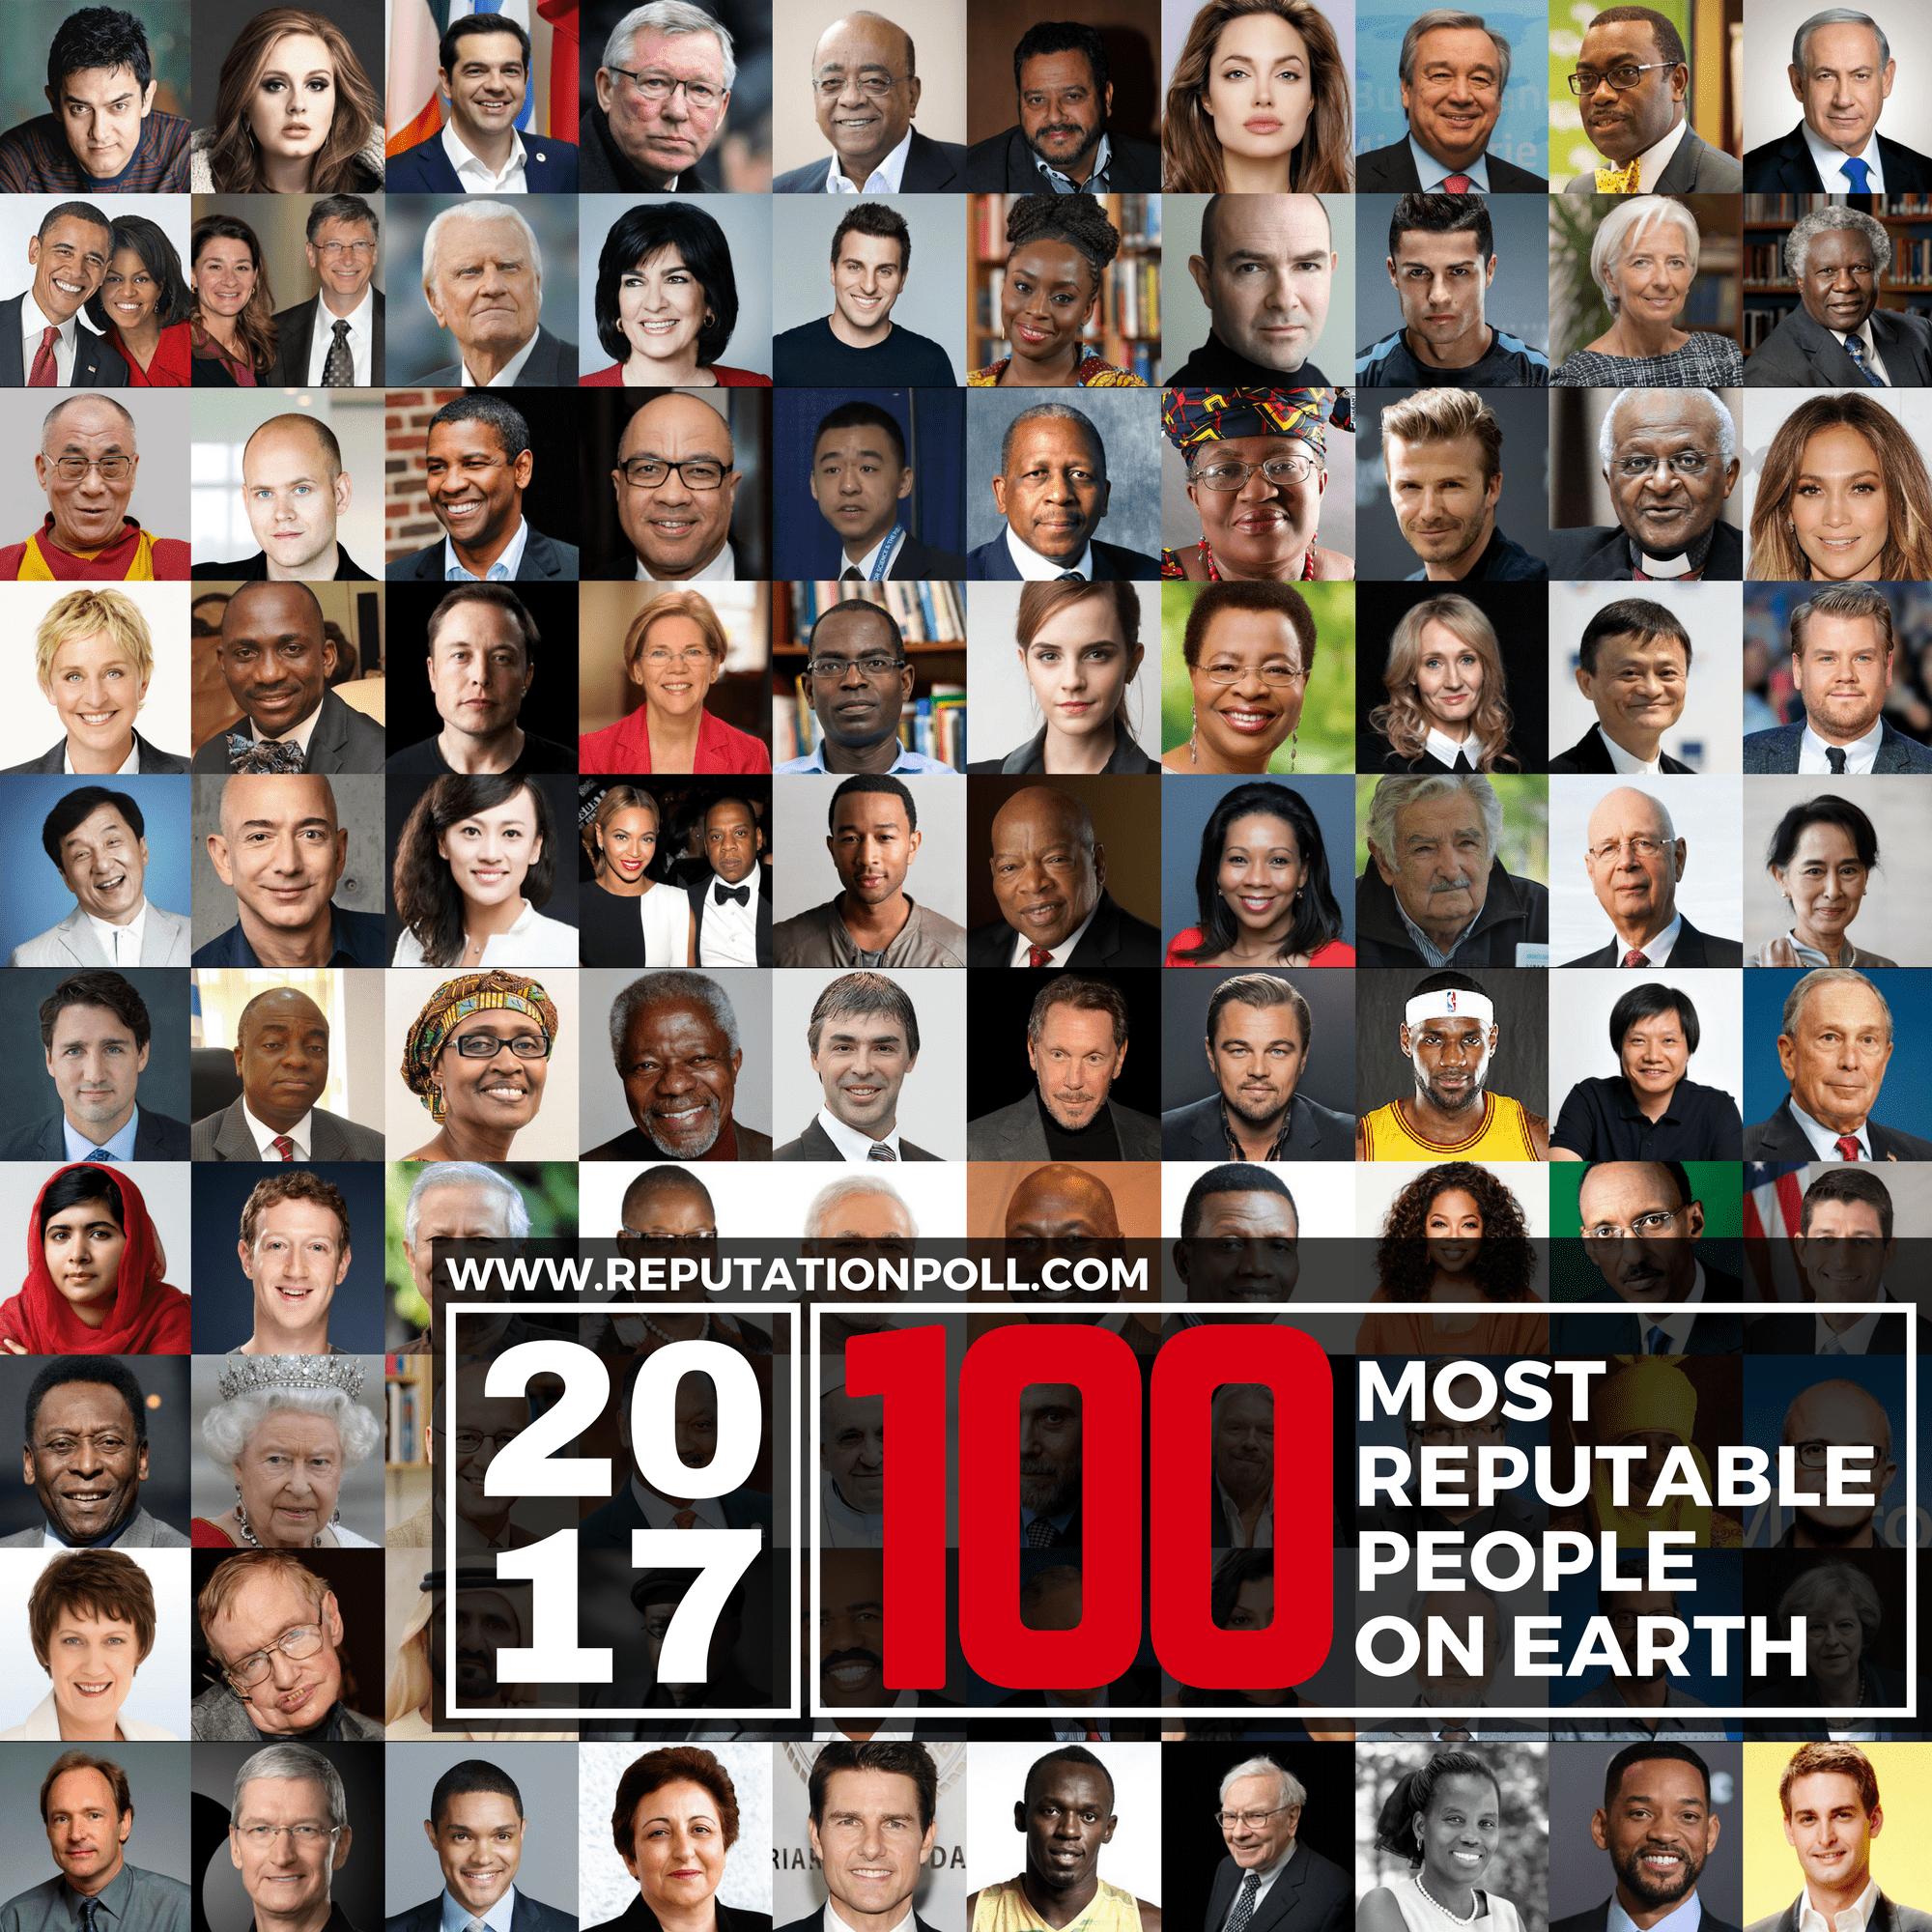 2017 Most Reputable People On Earth Reputation Poll Reputationpoll Cetak Foto Ukuran 24r Salon Global